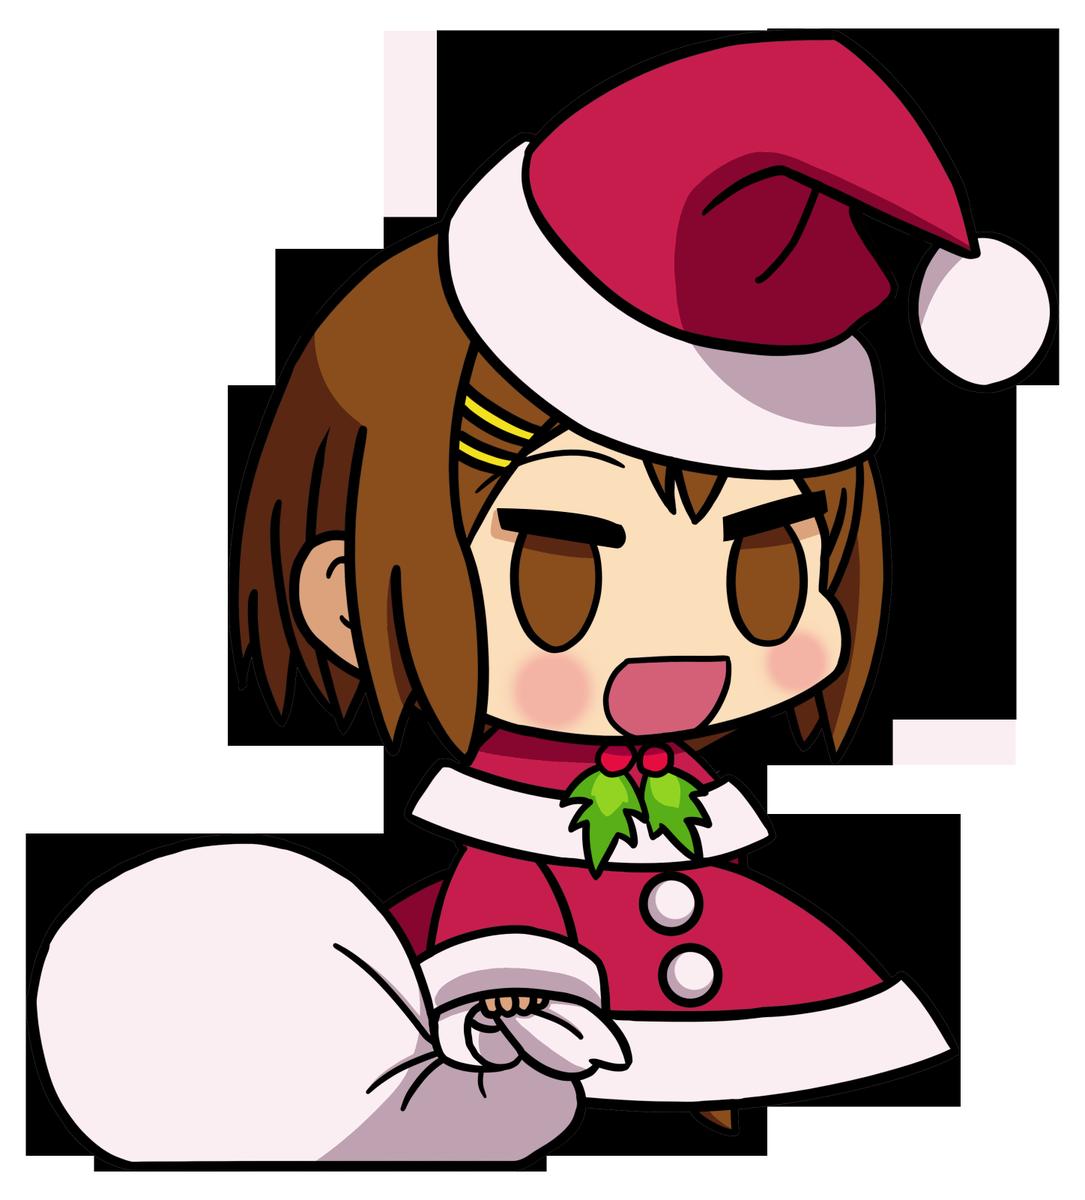 Commission I Did Of A Yui Padoru Br Http Pic Twitter Com 1eqbmqunld Anime Masculino Anime Memes